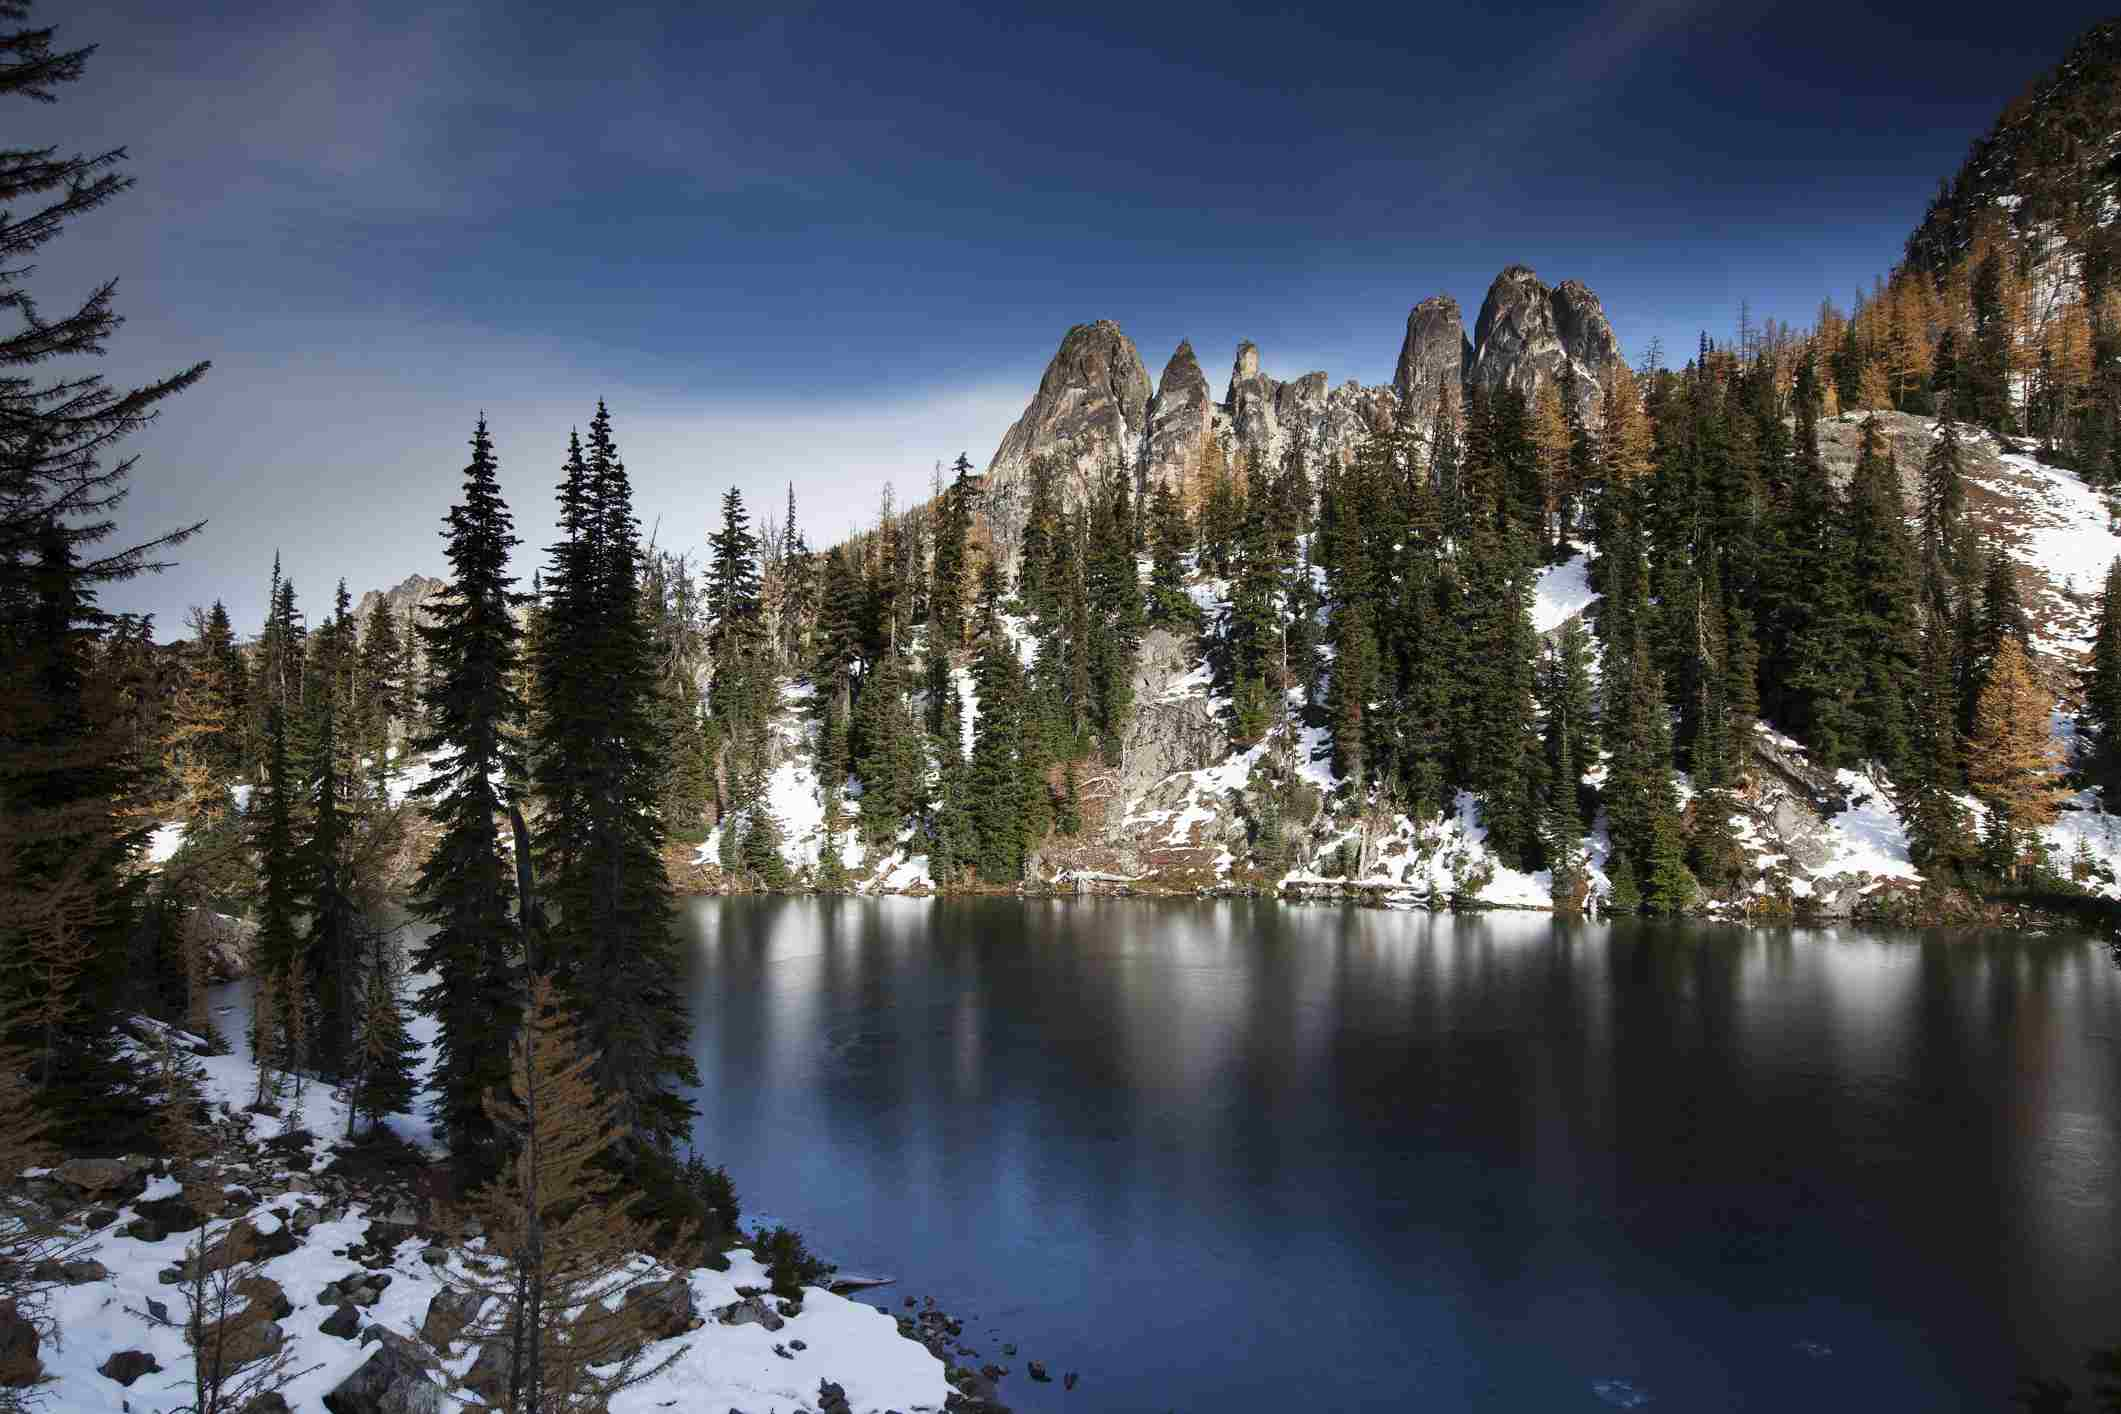 Lago azul en otoño, Newhalem, Washington, Estados Unidos